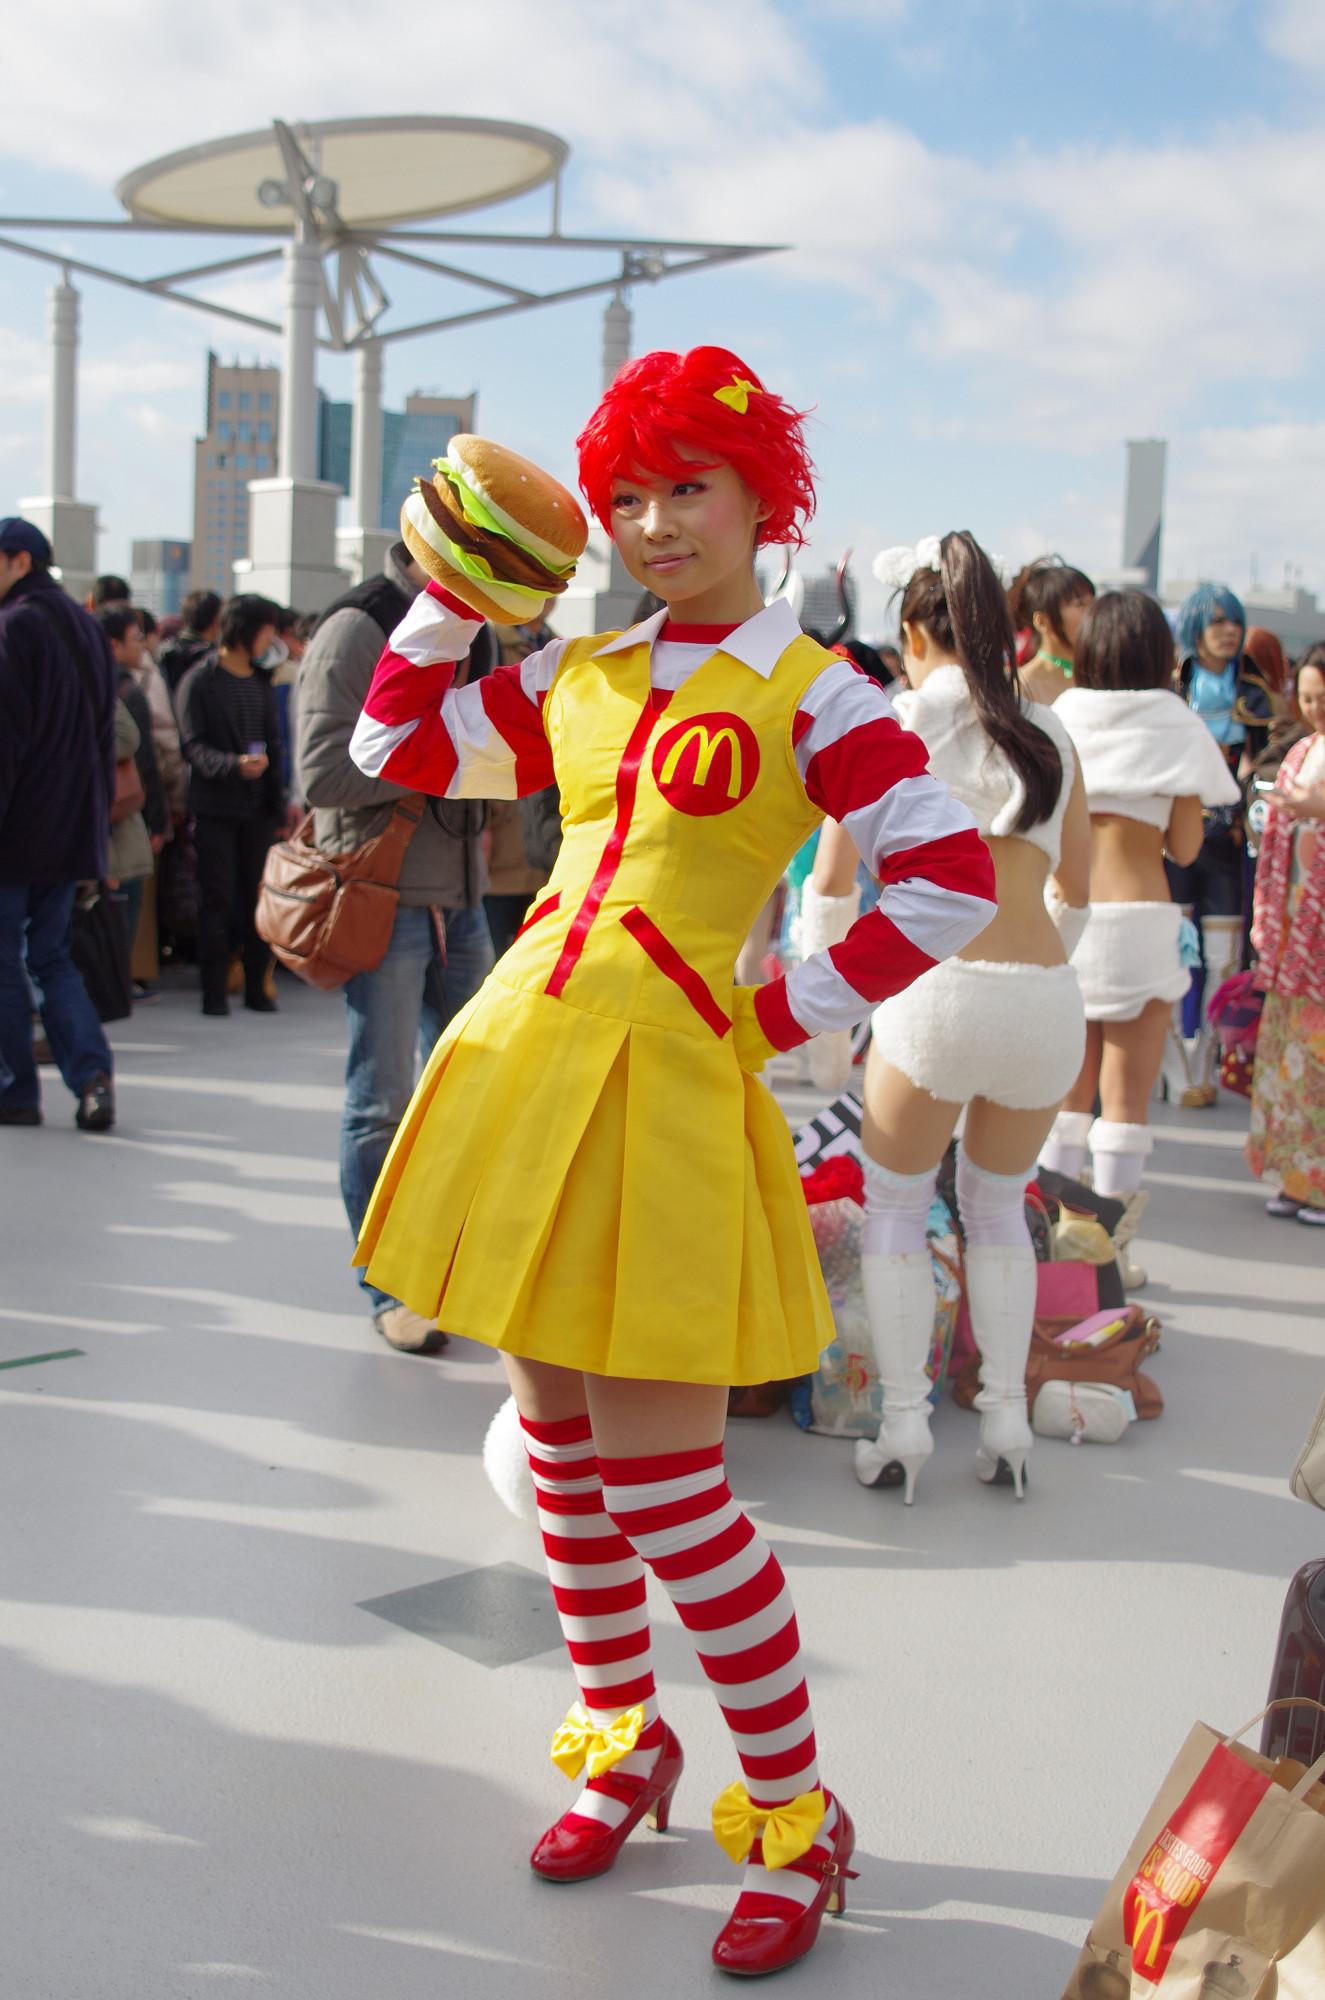 Ronald McDonald cosplay